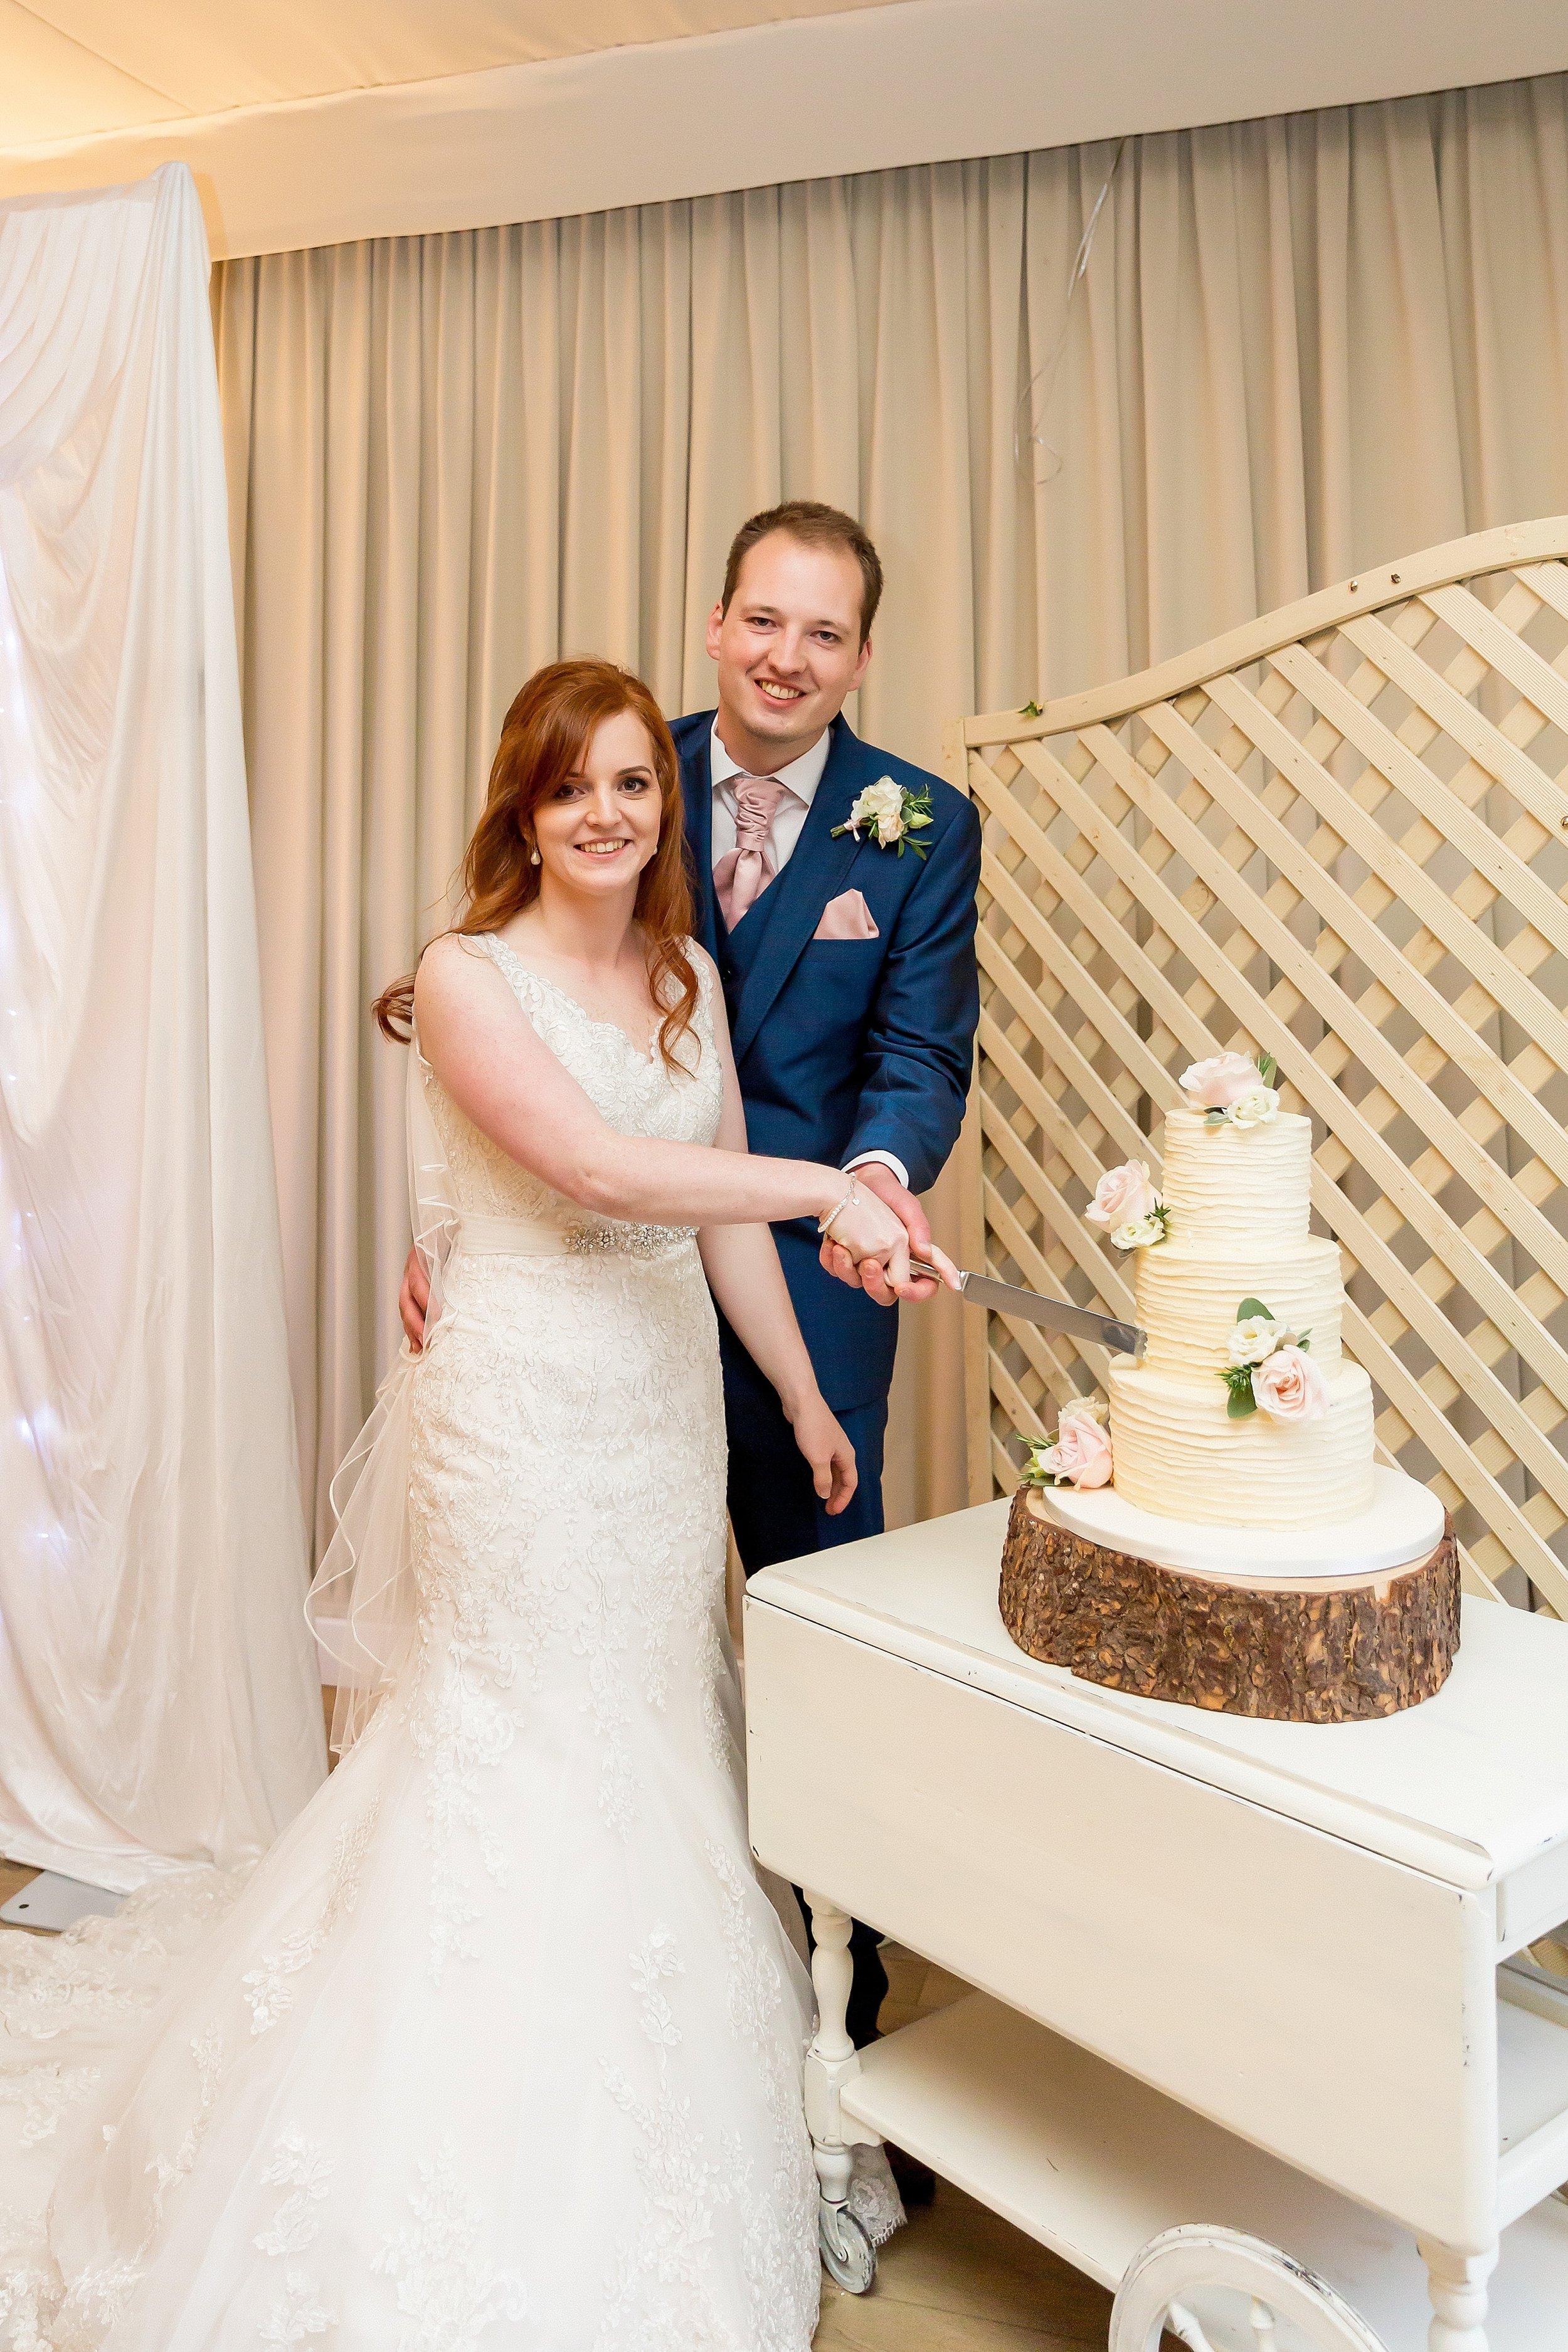 wedding cake ideas somerset.jpg